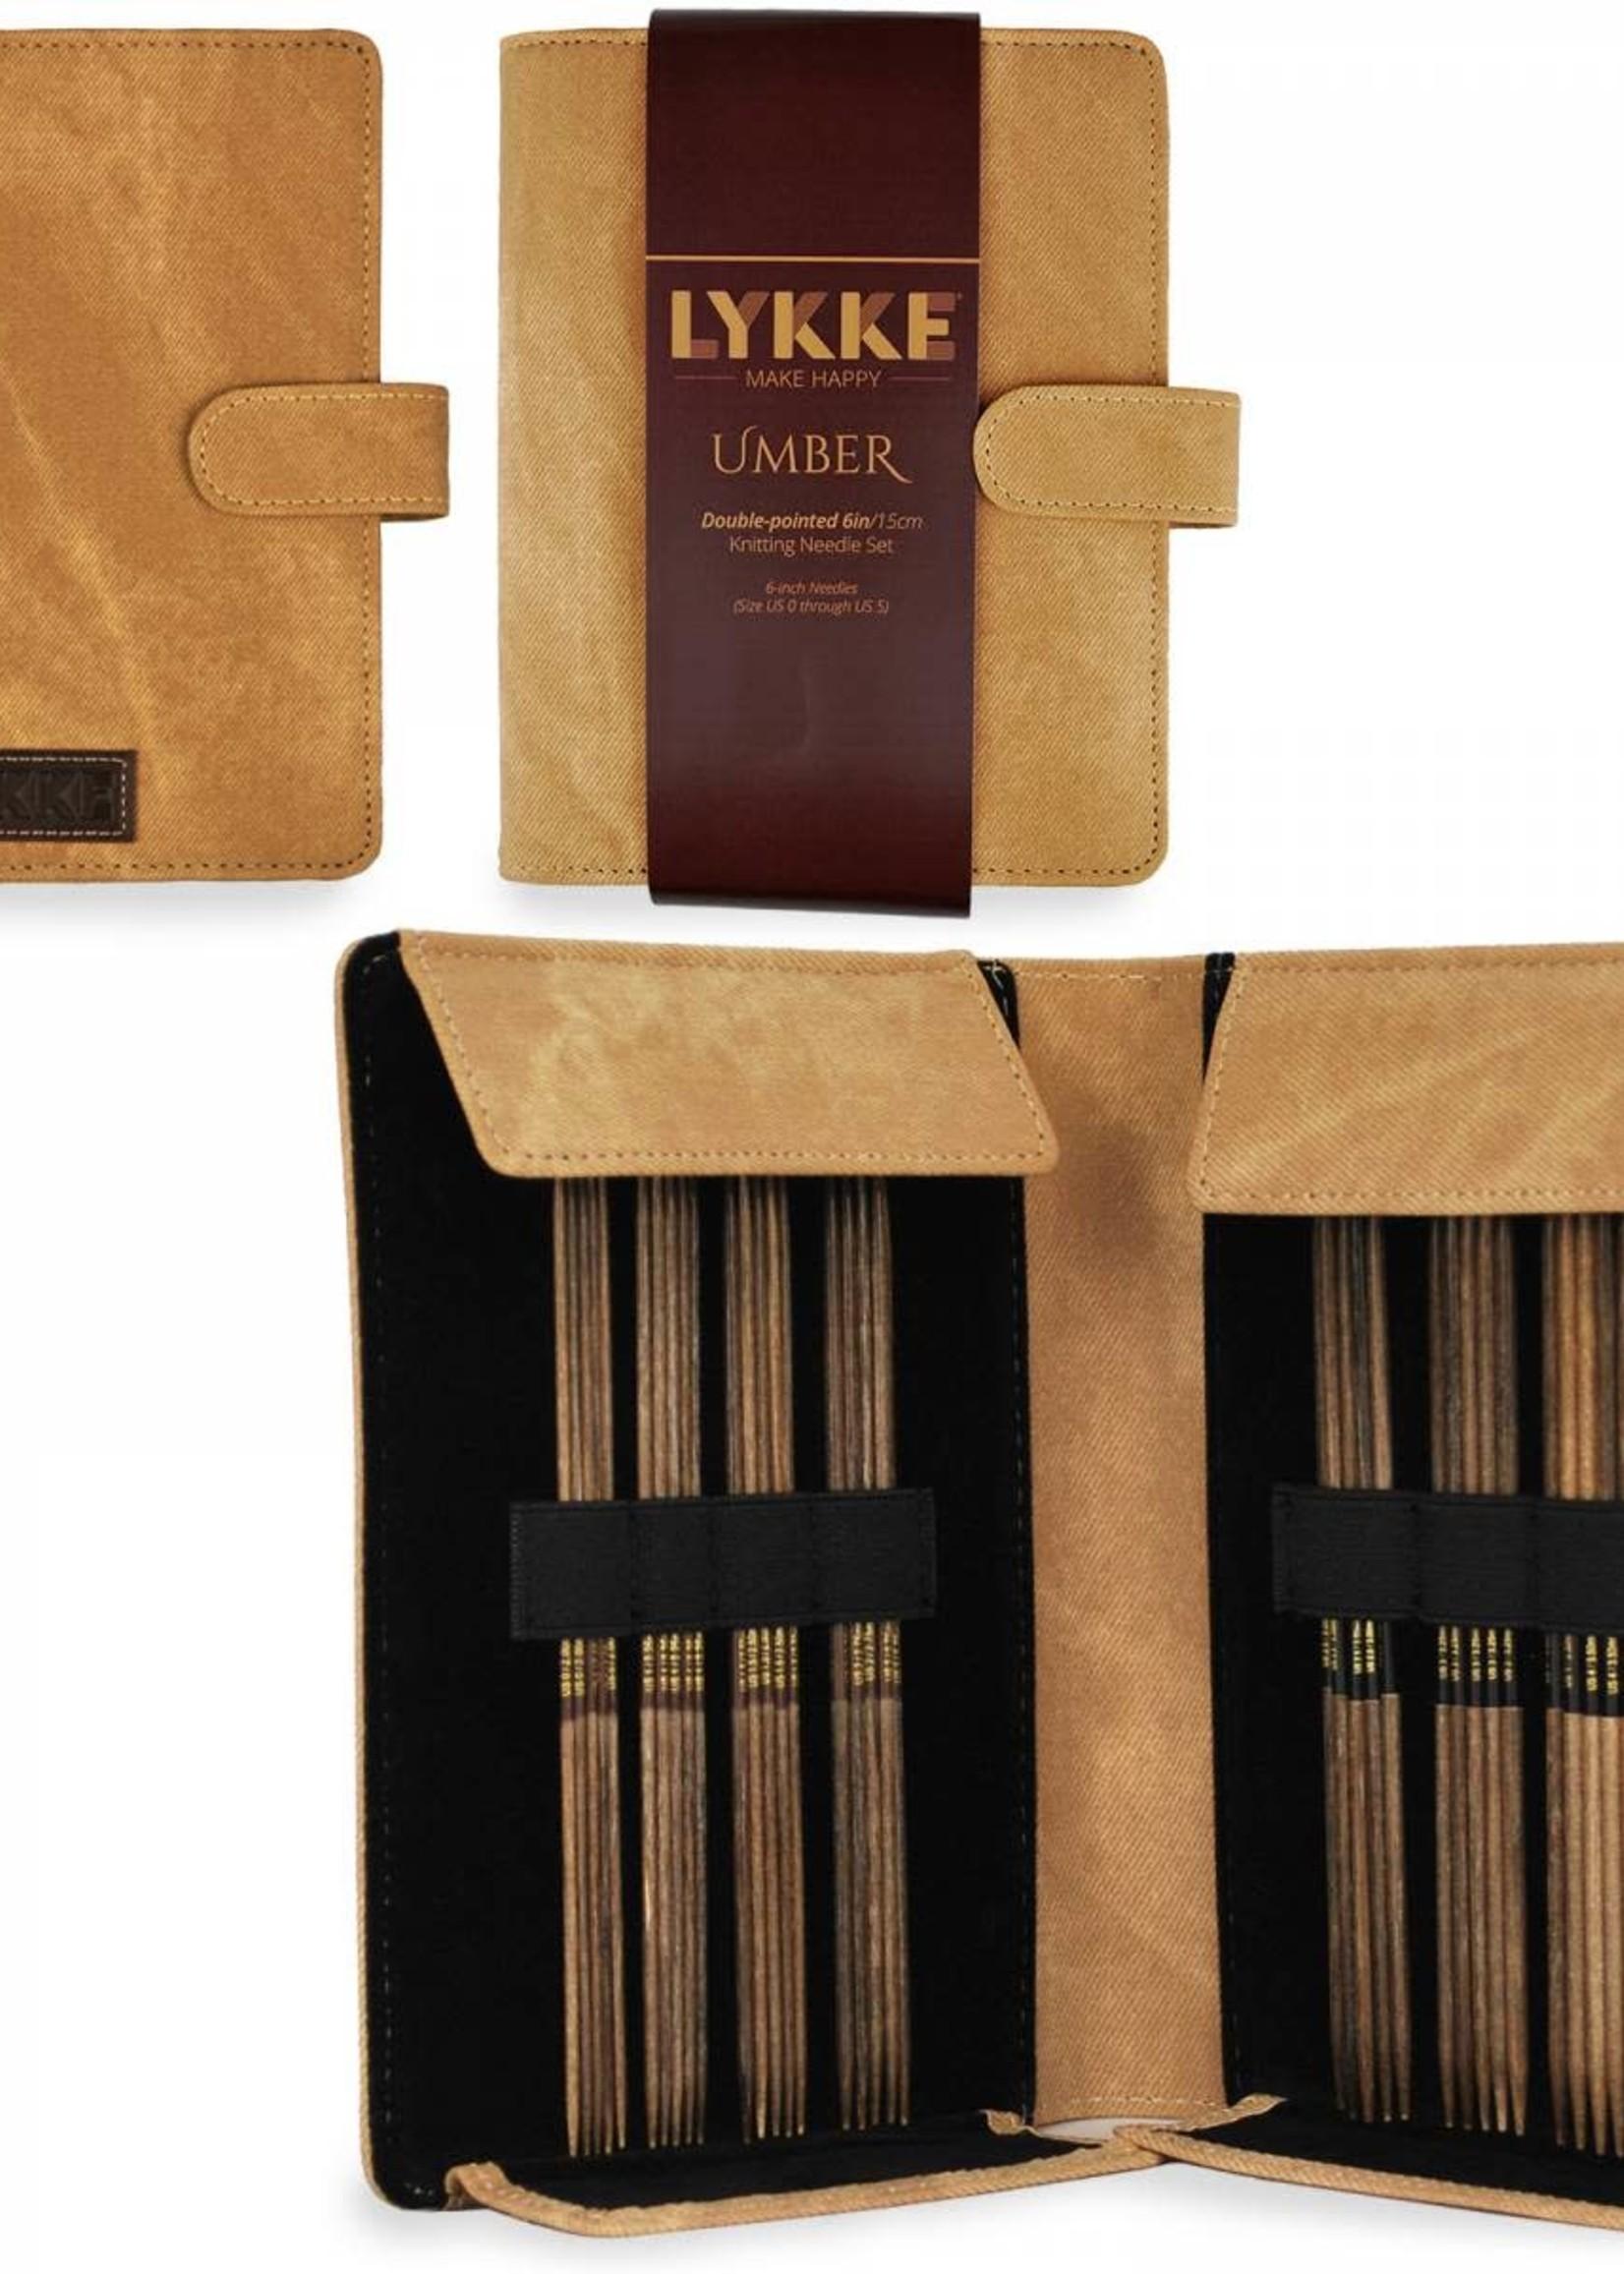 "Lykke Needles Lykke Double Pointed Set - 6"" Umber Driftwood Small - Umber Case"